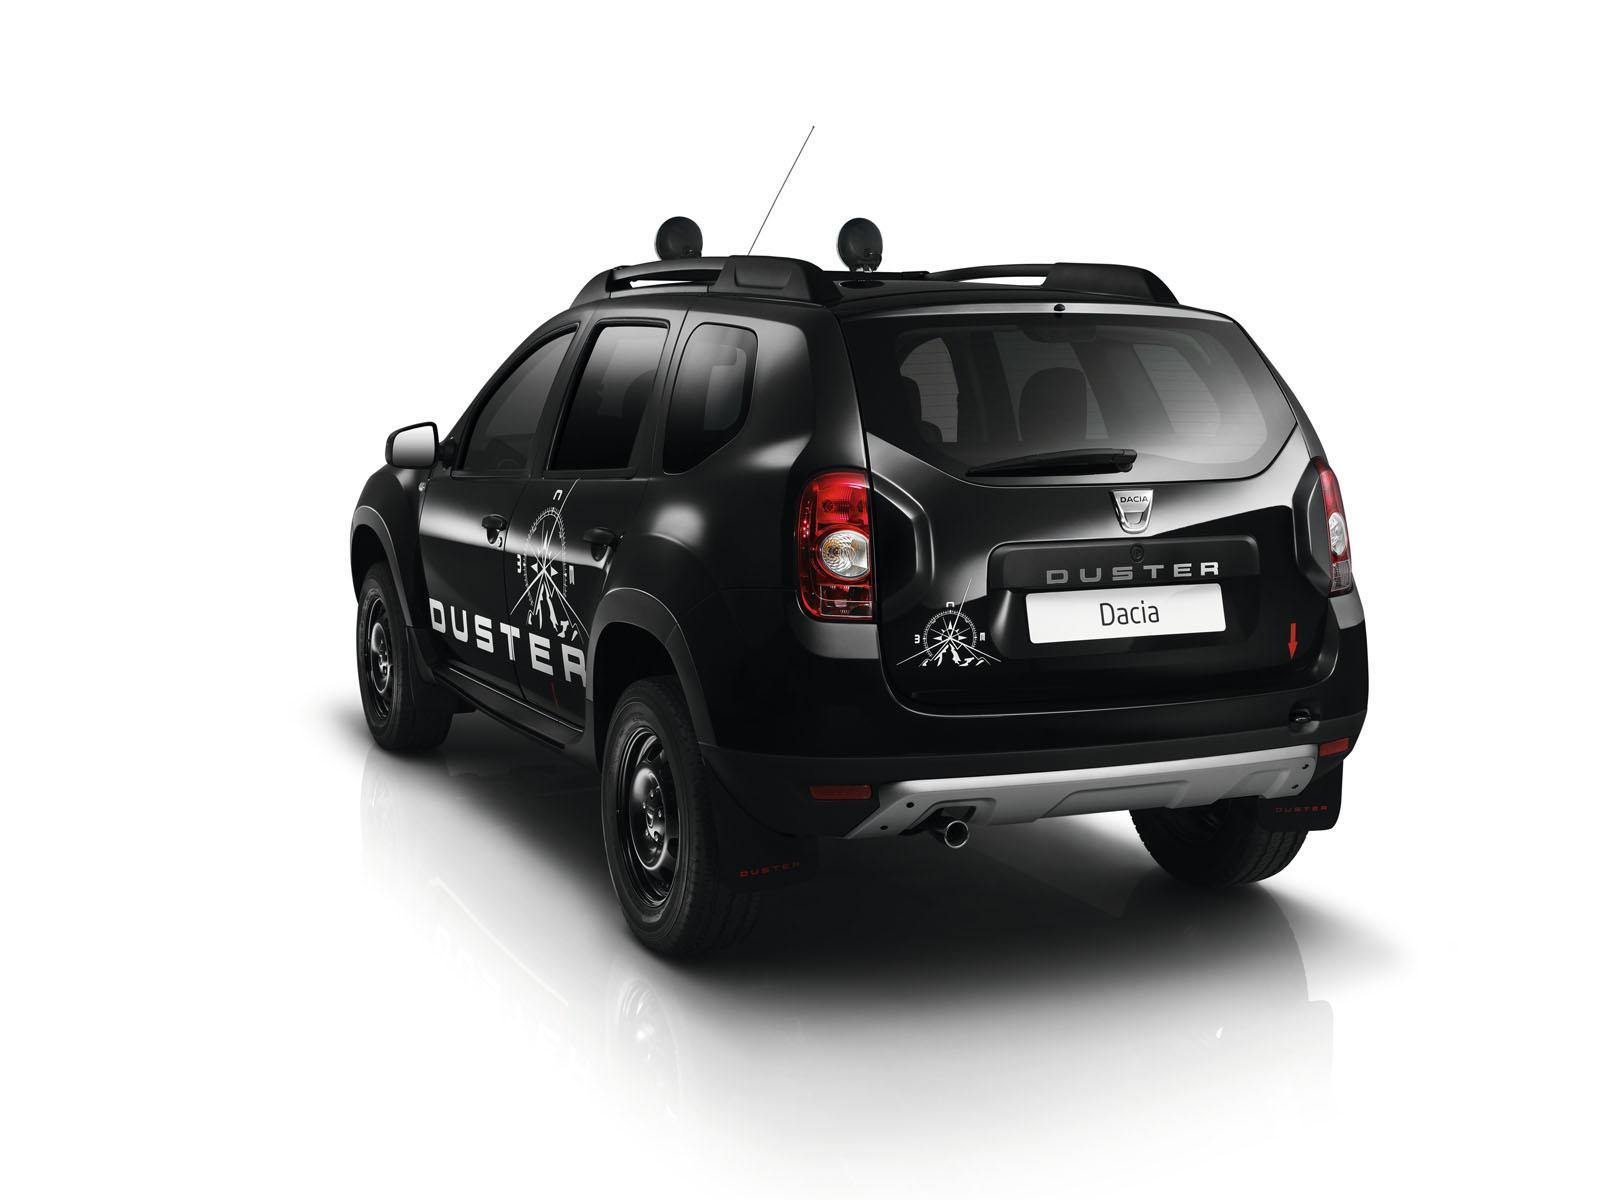 2013 Geneva Motor Show: Dacia Duster Adventure Edition  - фотография №10